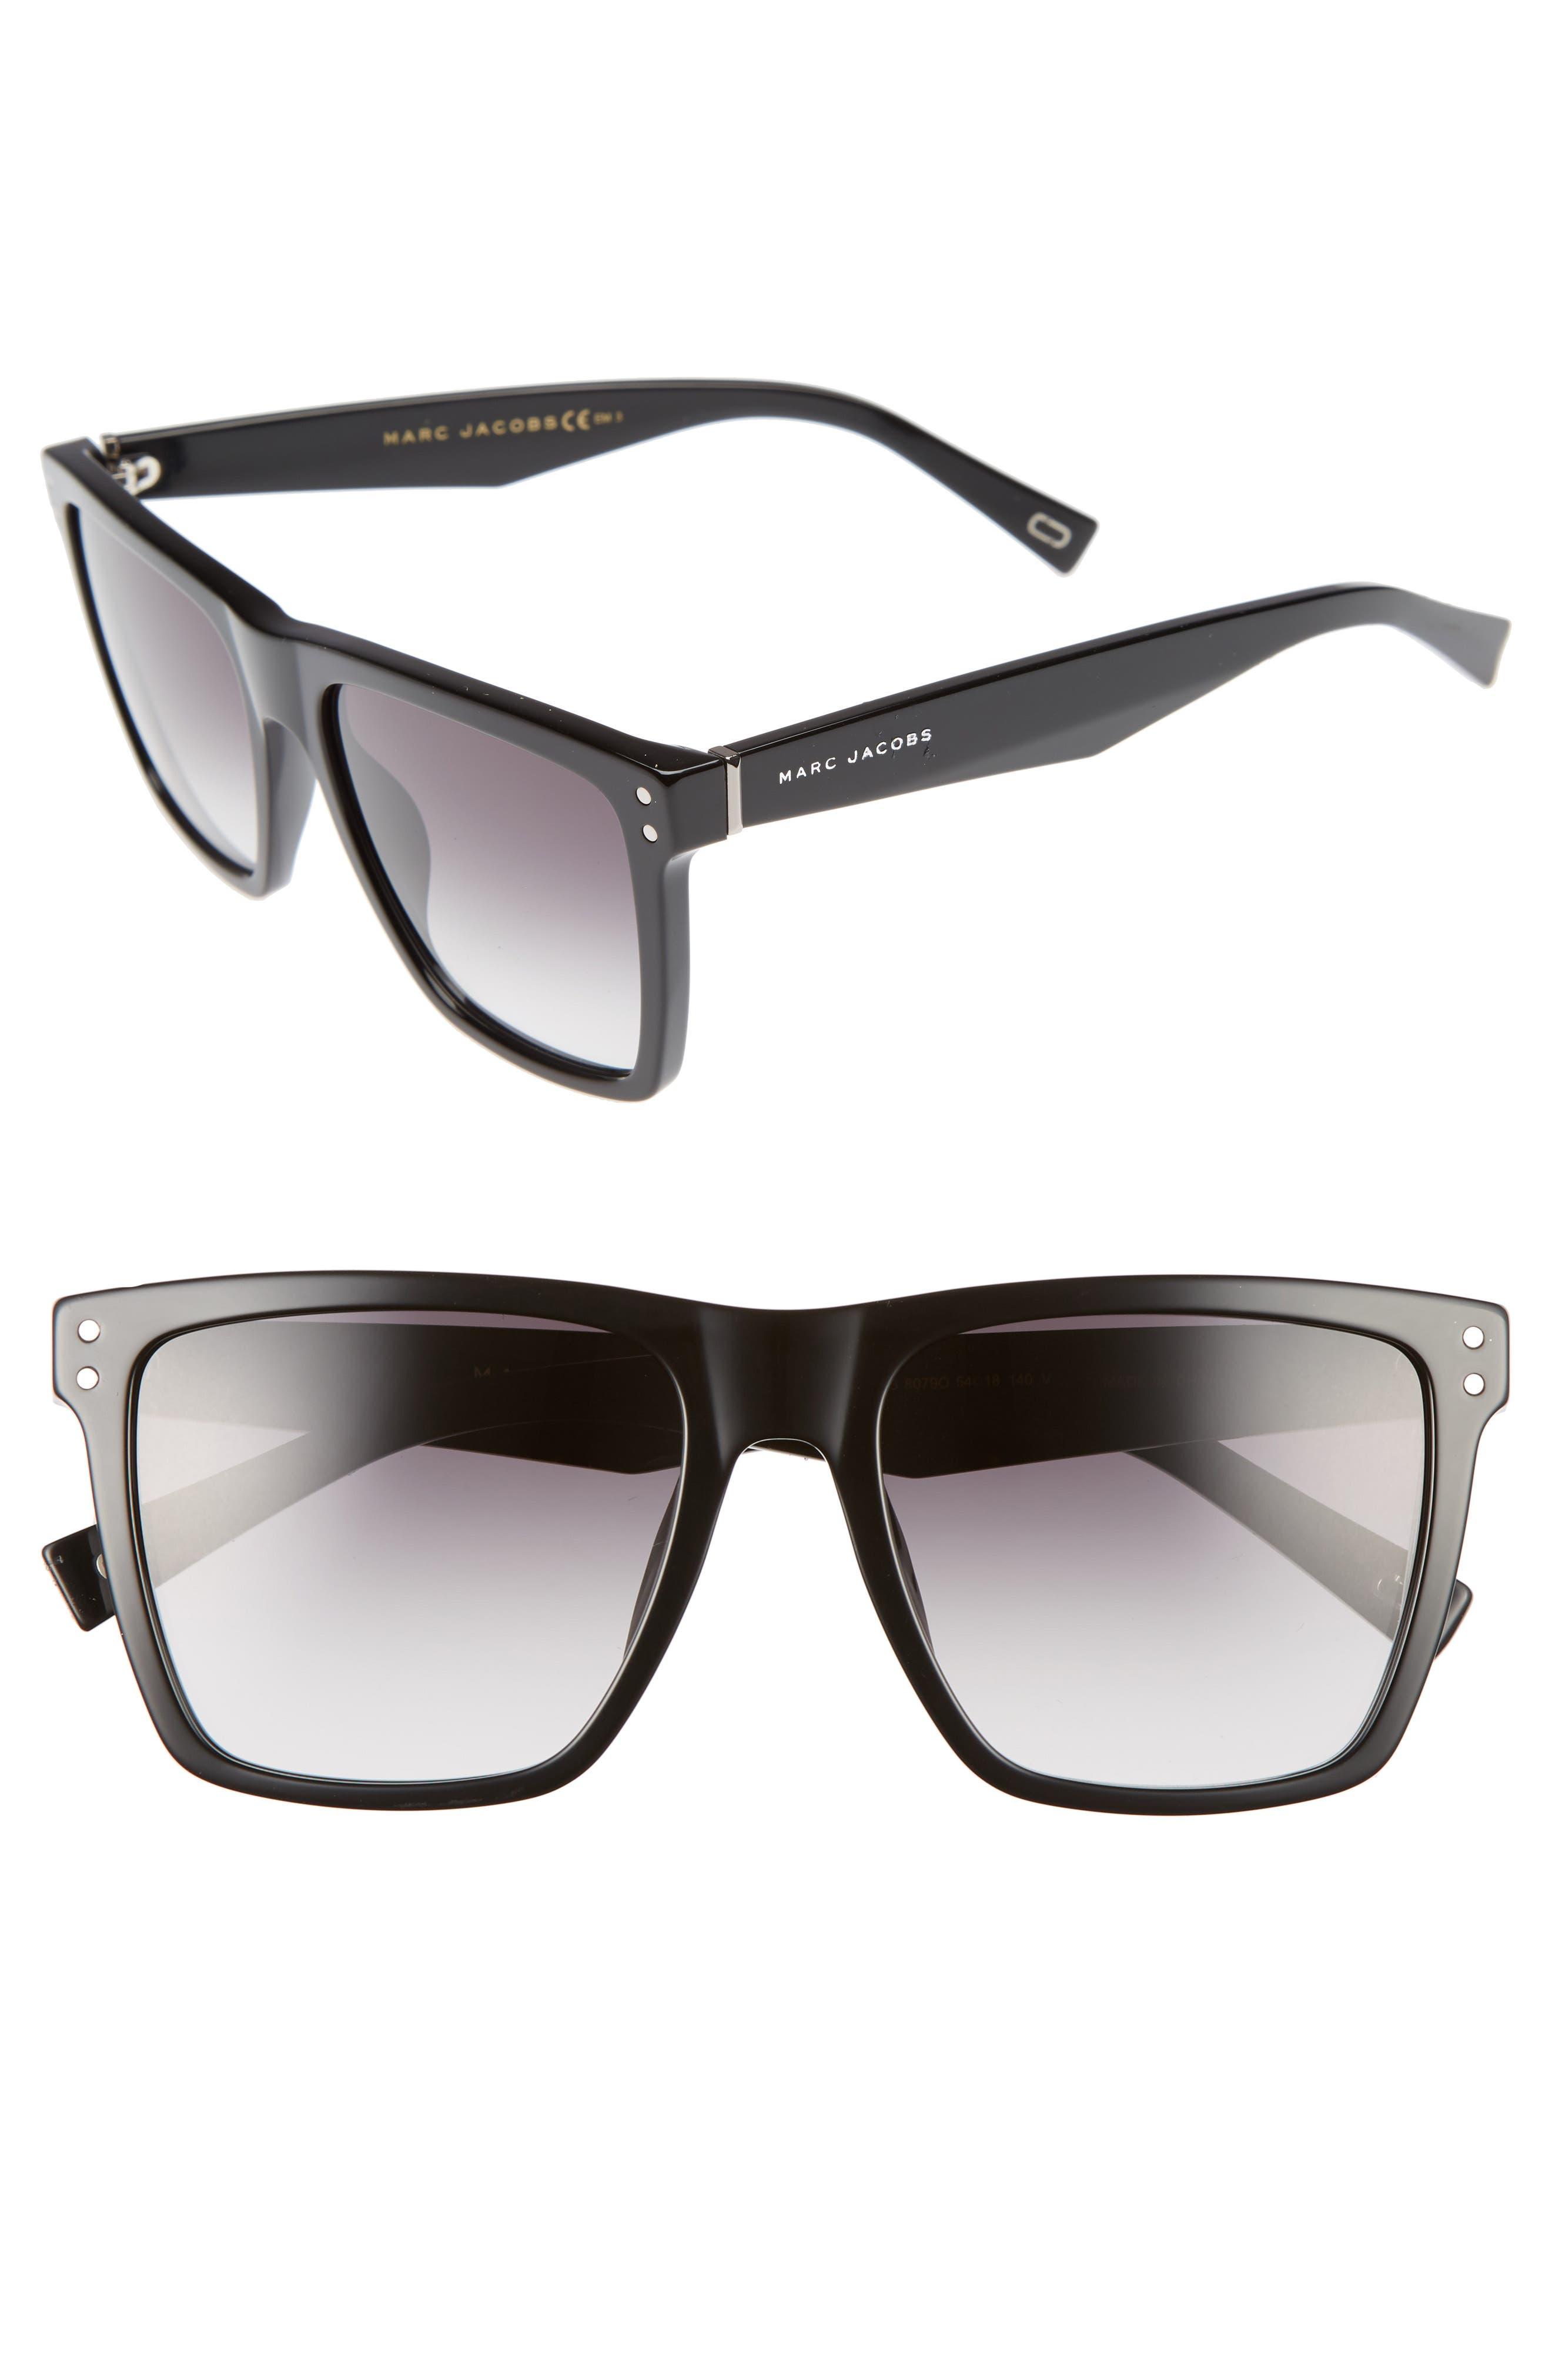 54mm Flat Top Gradient Square Frame Sunglasses,                             Alternate thumbnail 2, color,                             001